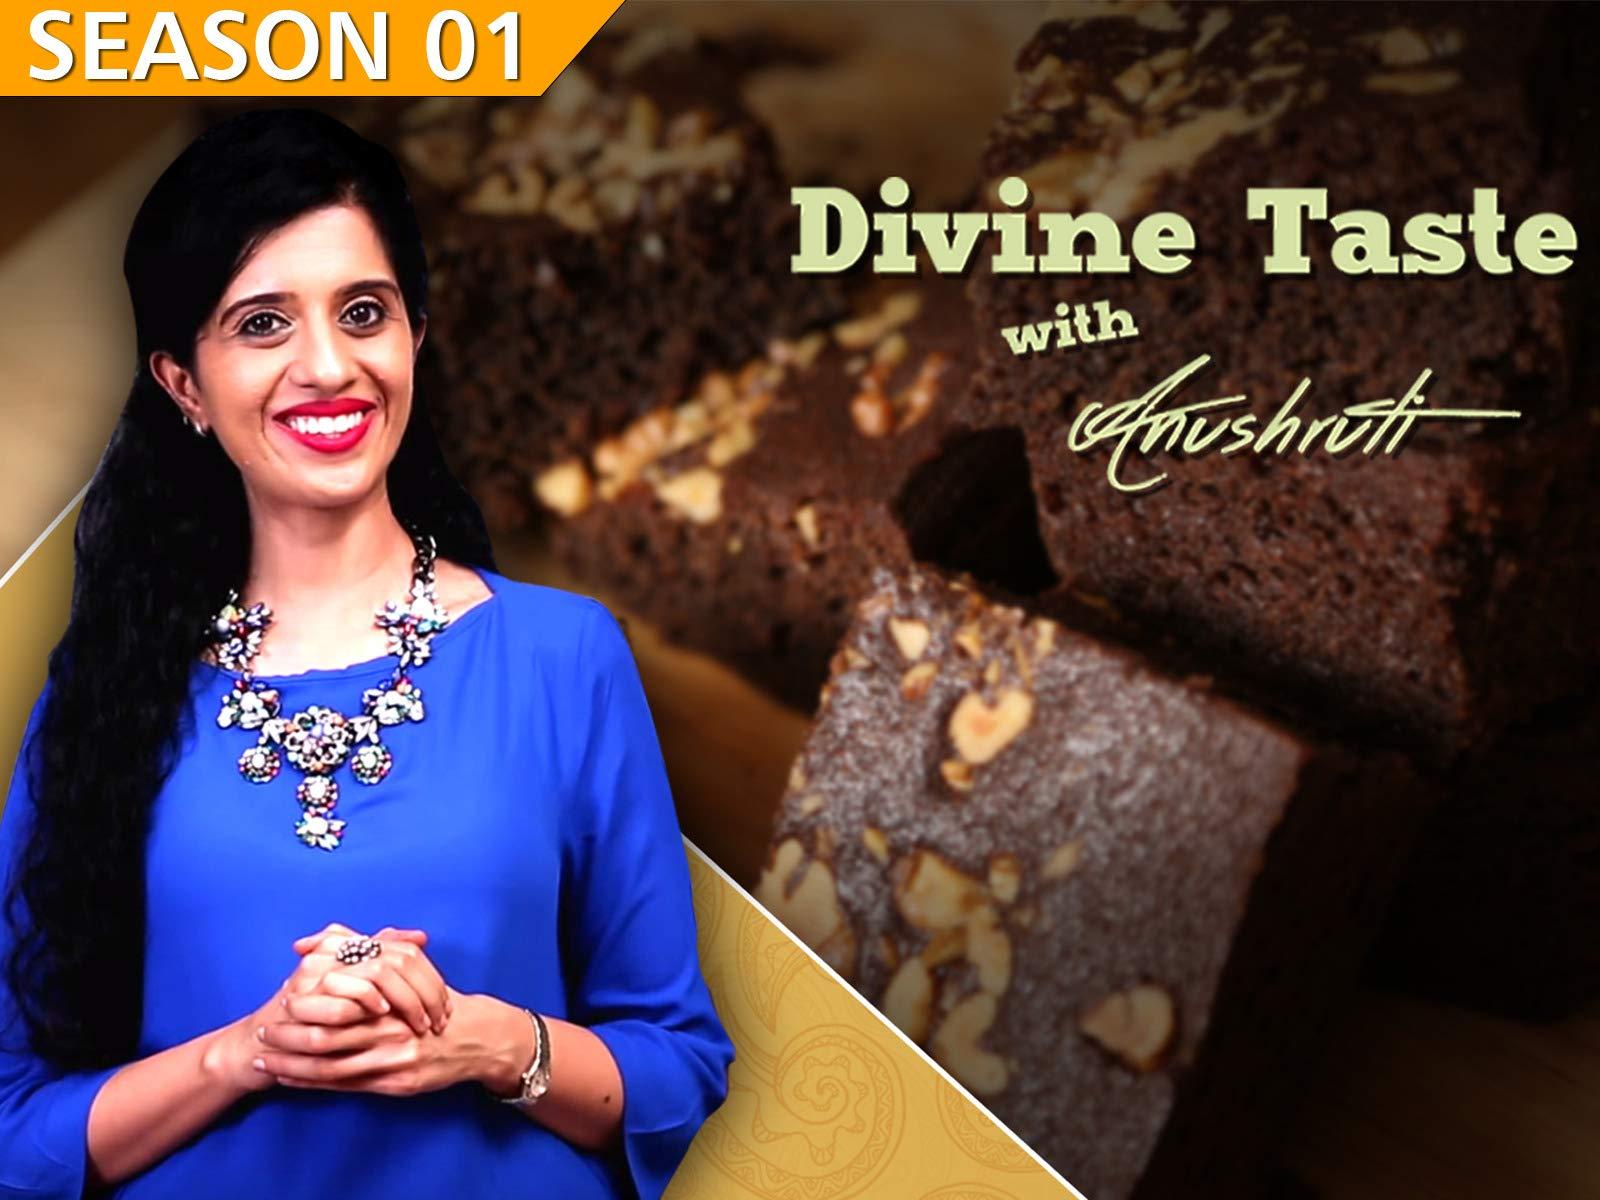 Clip: Divine Taste With Anushruti - Season 1